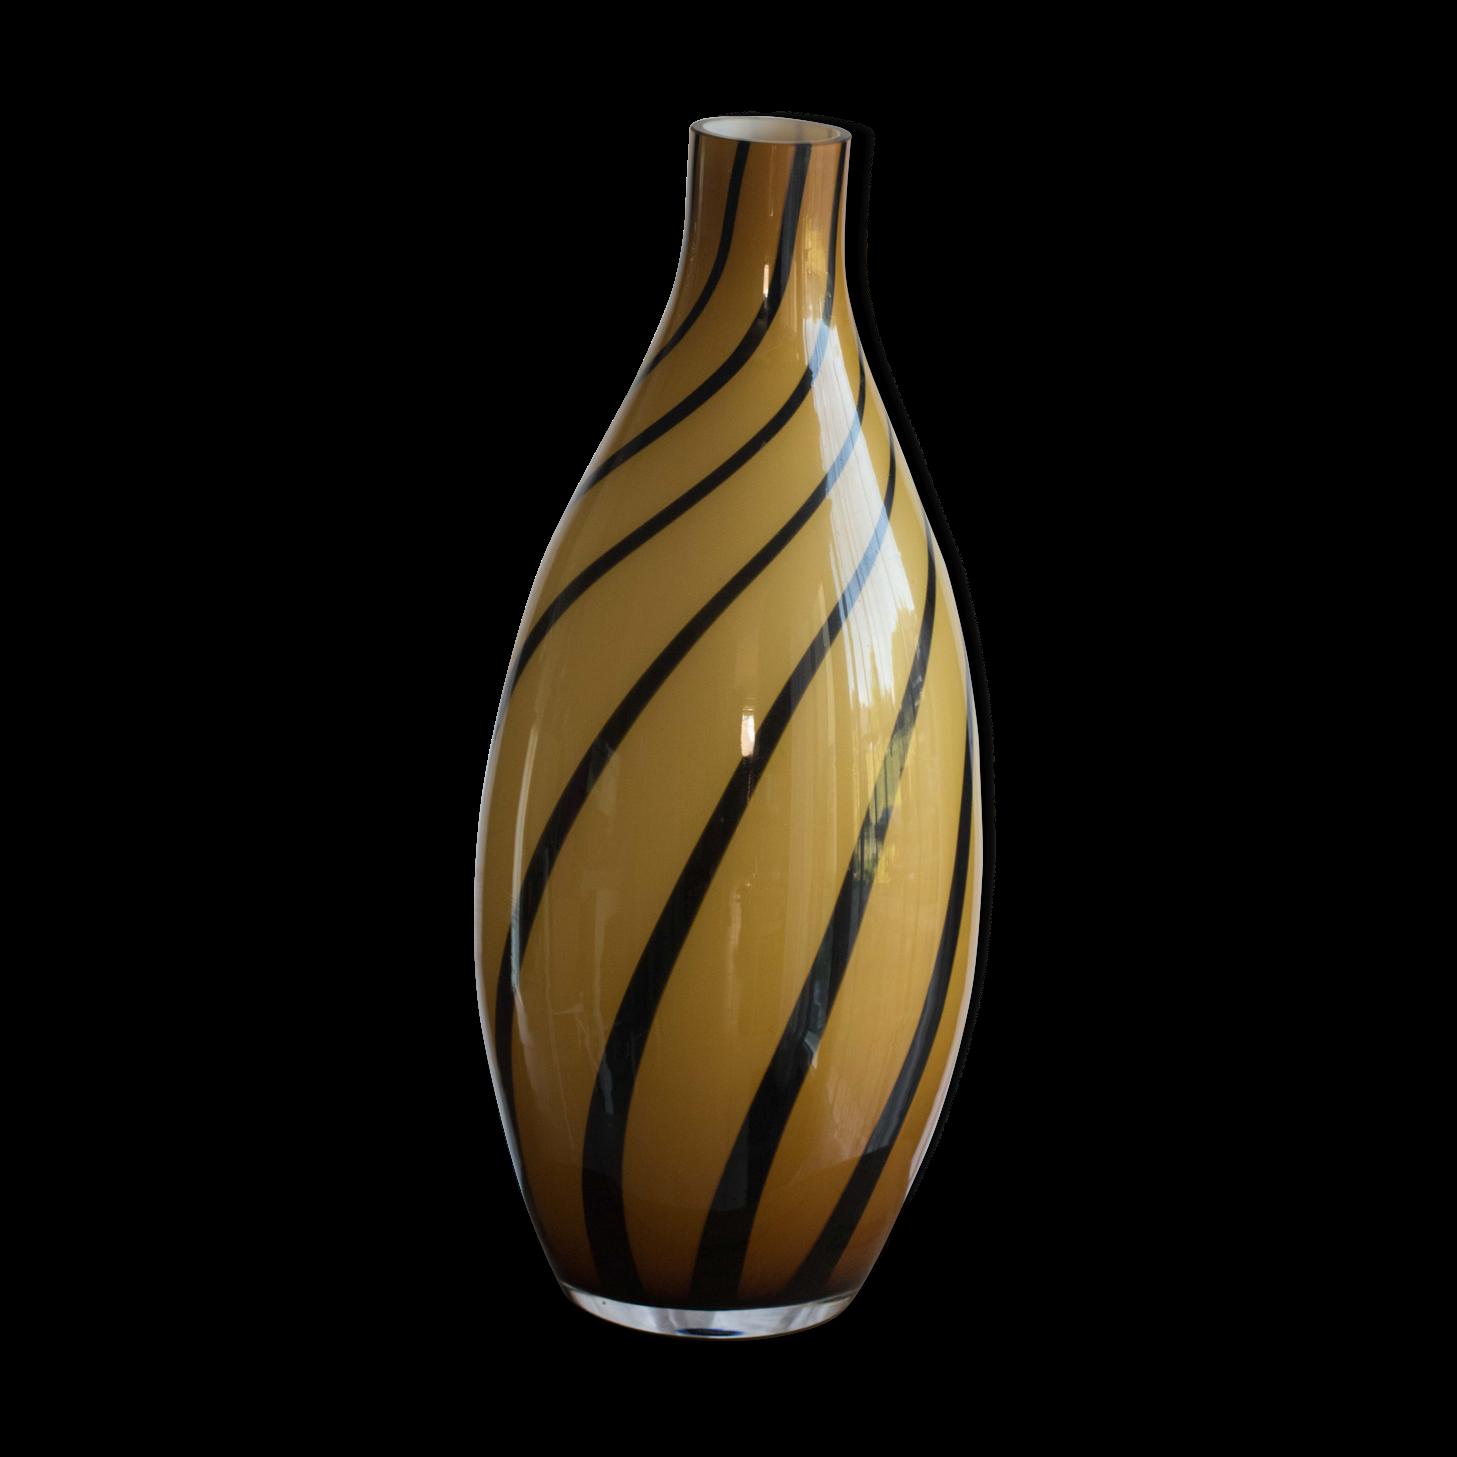 vase geant verre elegant la table ruthnoise meilleur vase verre martini sur pied gant images. Black Bedroom Furniture Sets. Home Design Ideas